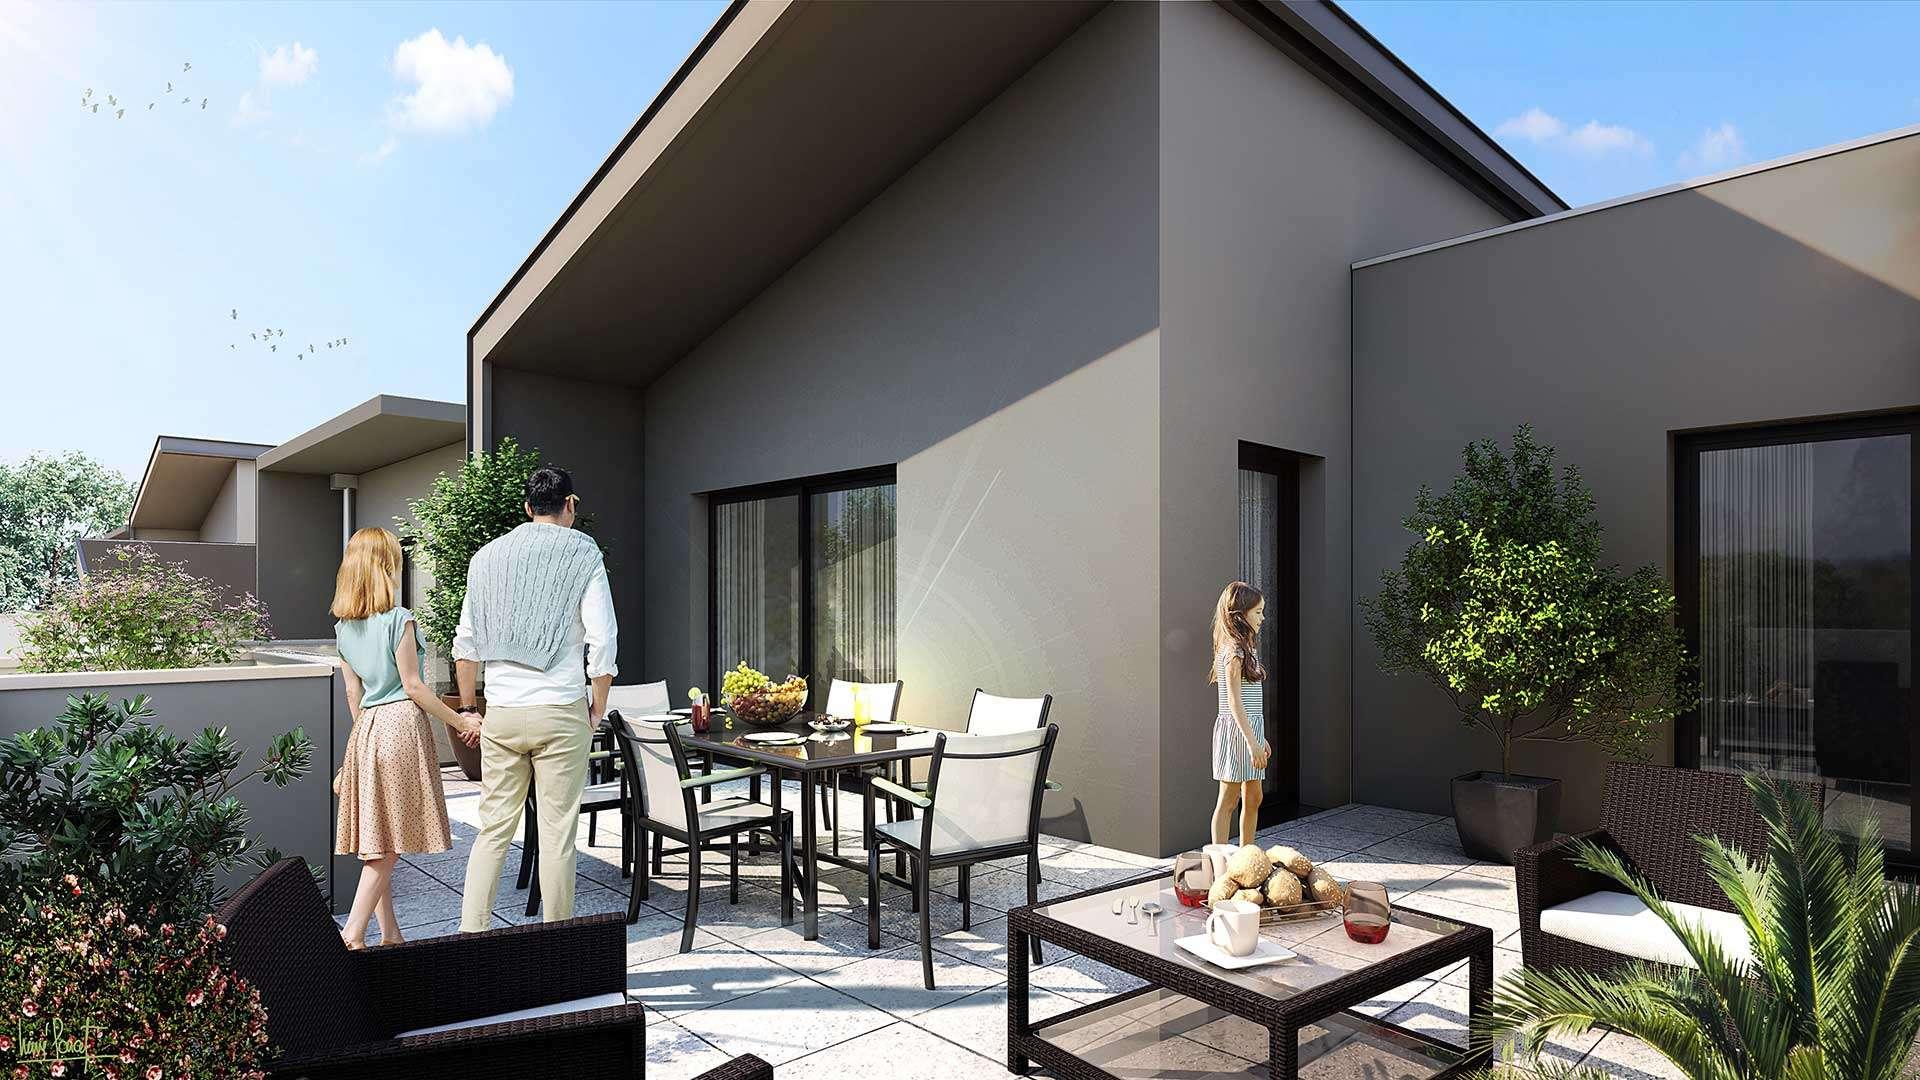 Appartement Neuf Valence Vilea Terrasse